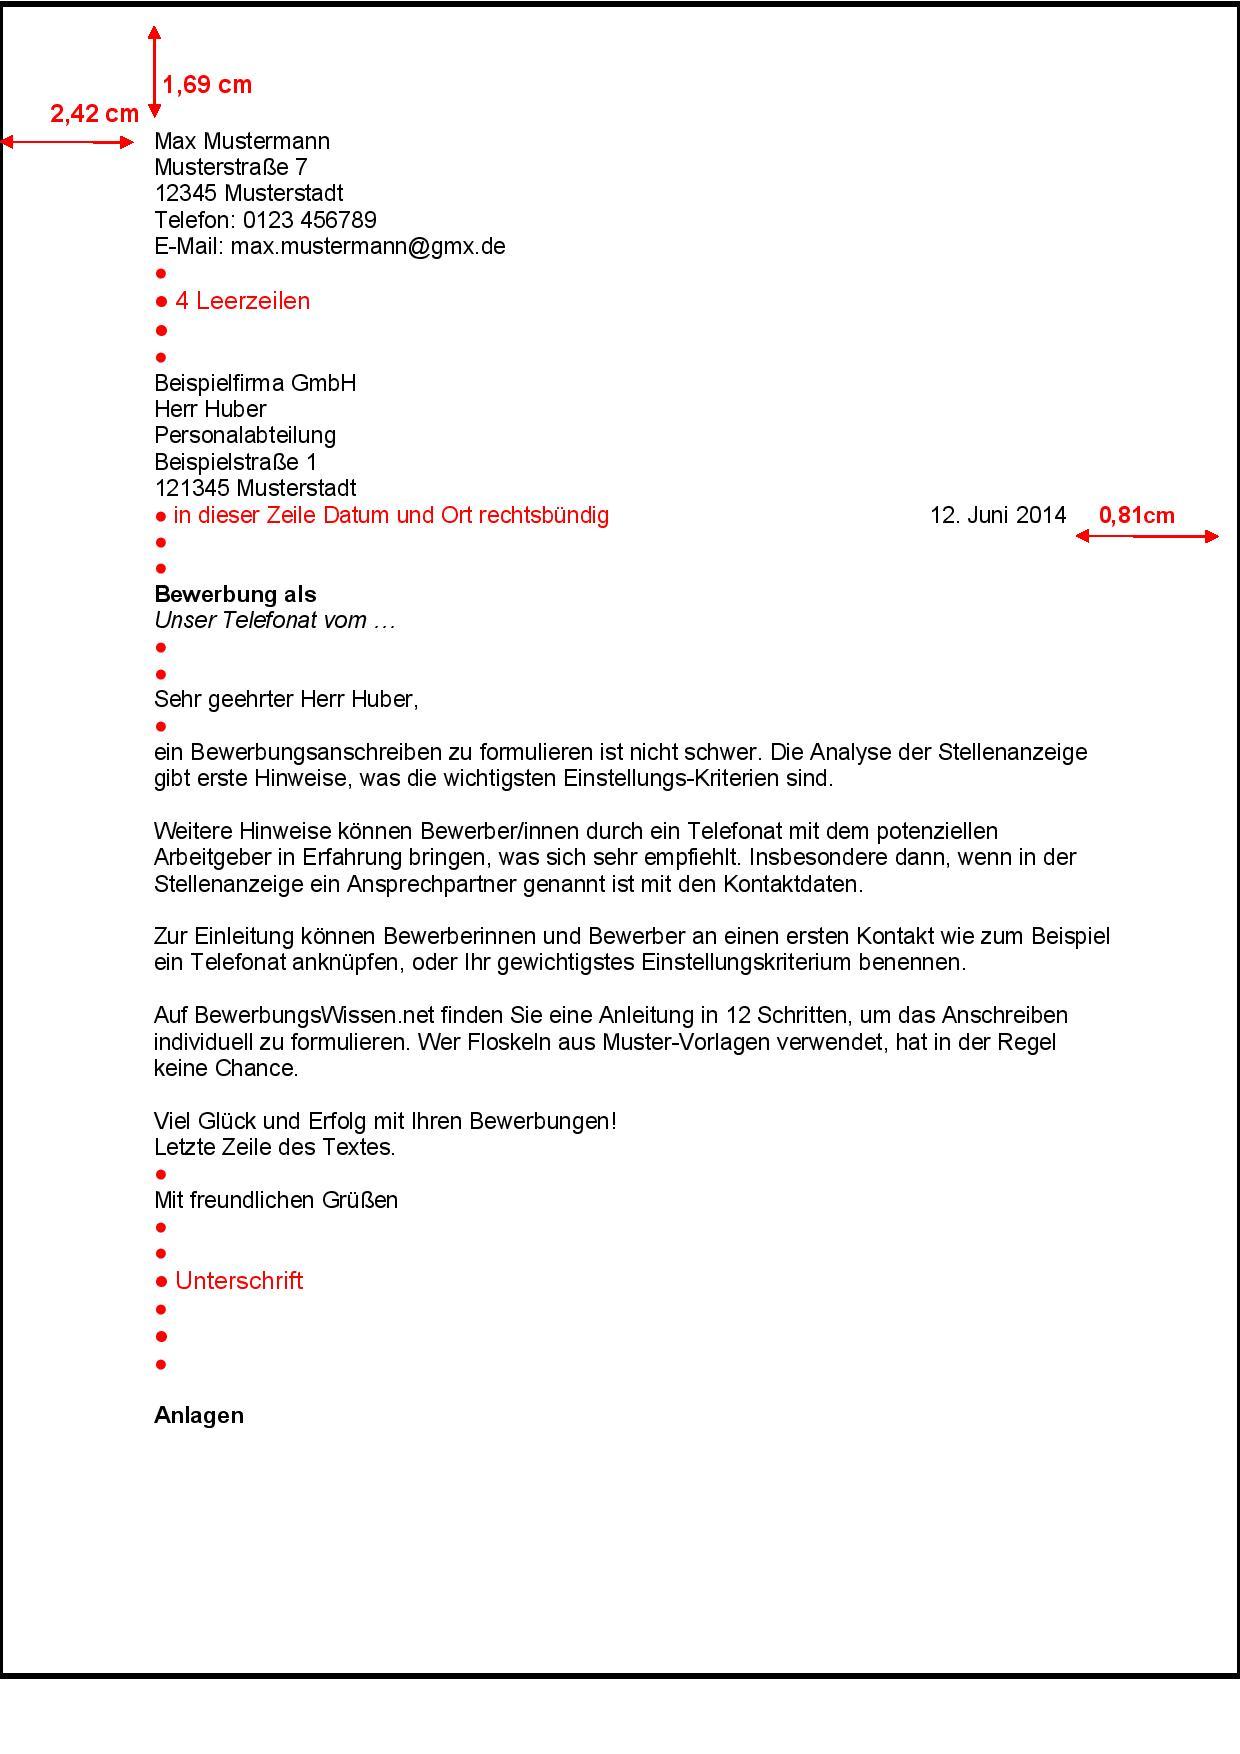 din 5008 bewerbungsschreiben muster - Bewerbung 2015